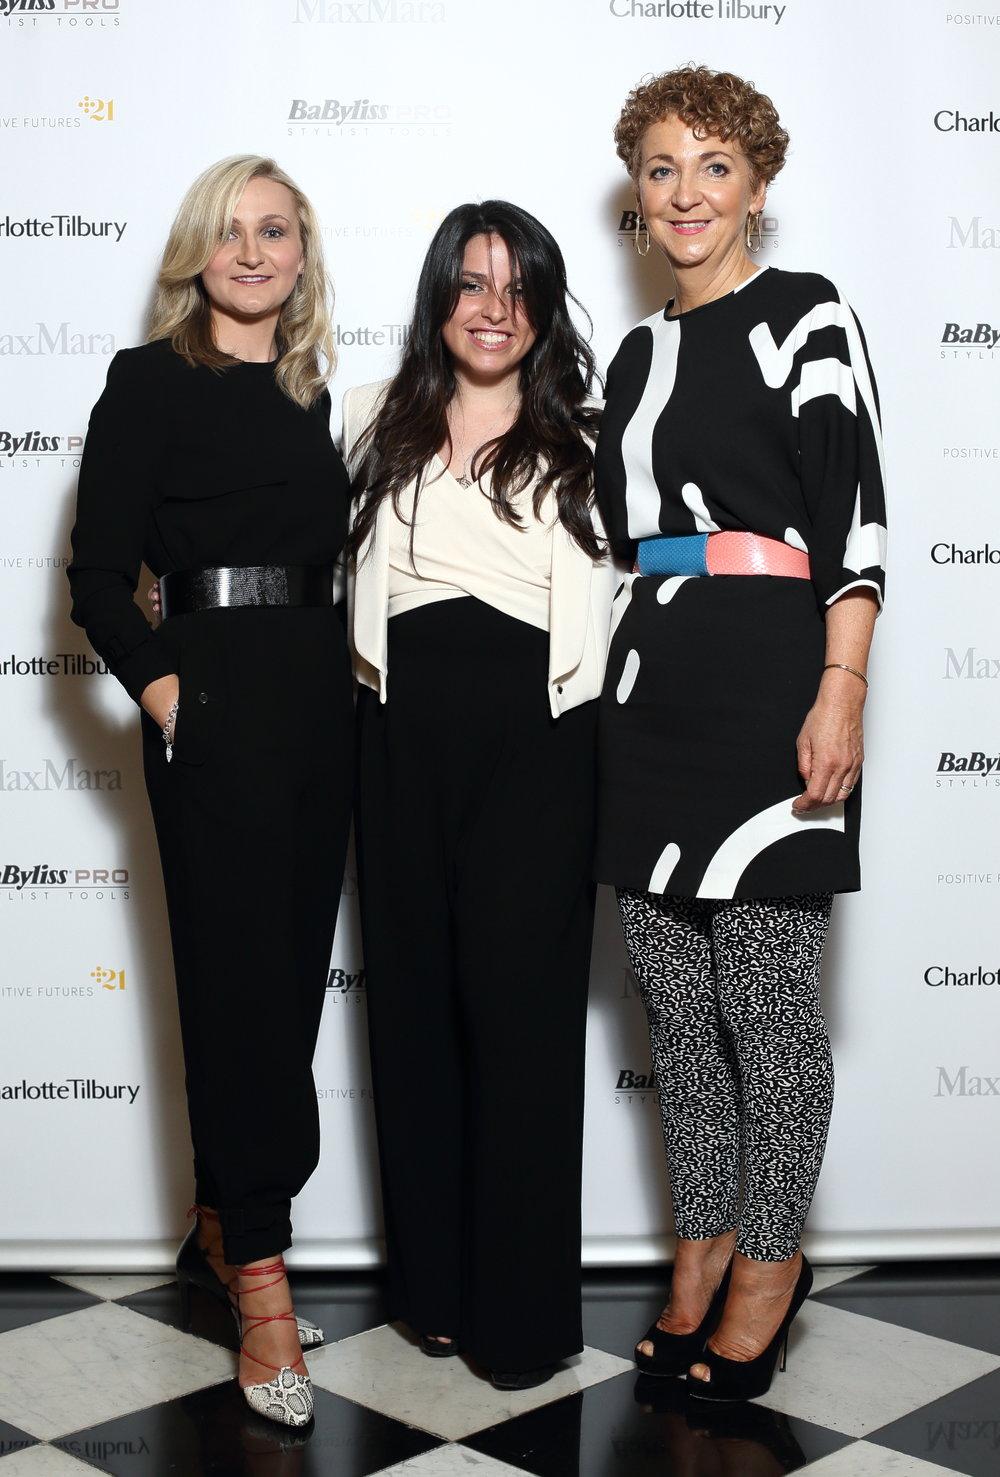 Nadine Thompson, Cecilia Manganelli and Agnes Lunny (2)..JPG